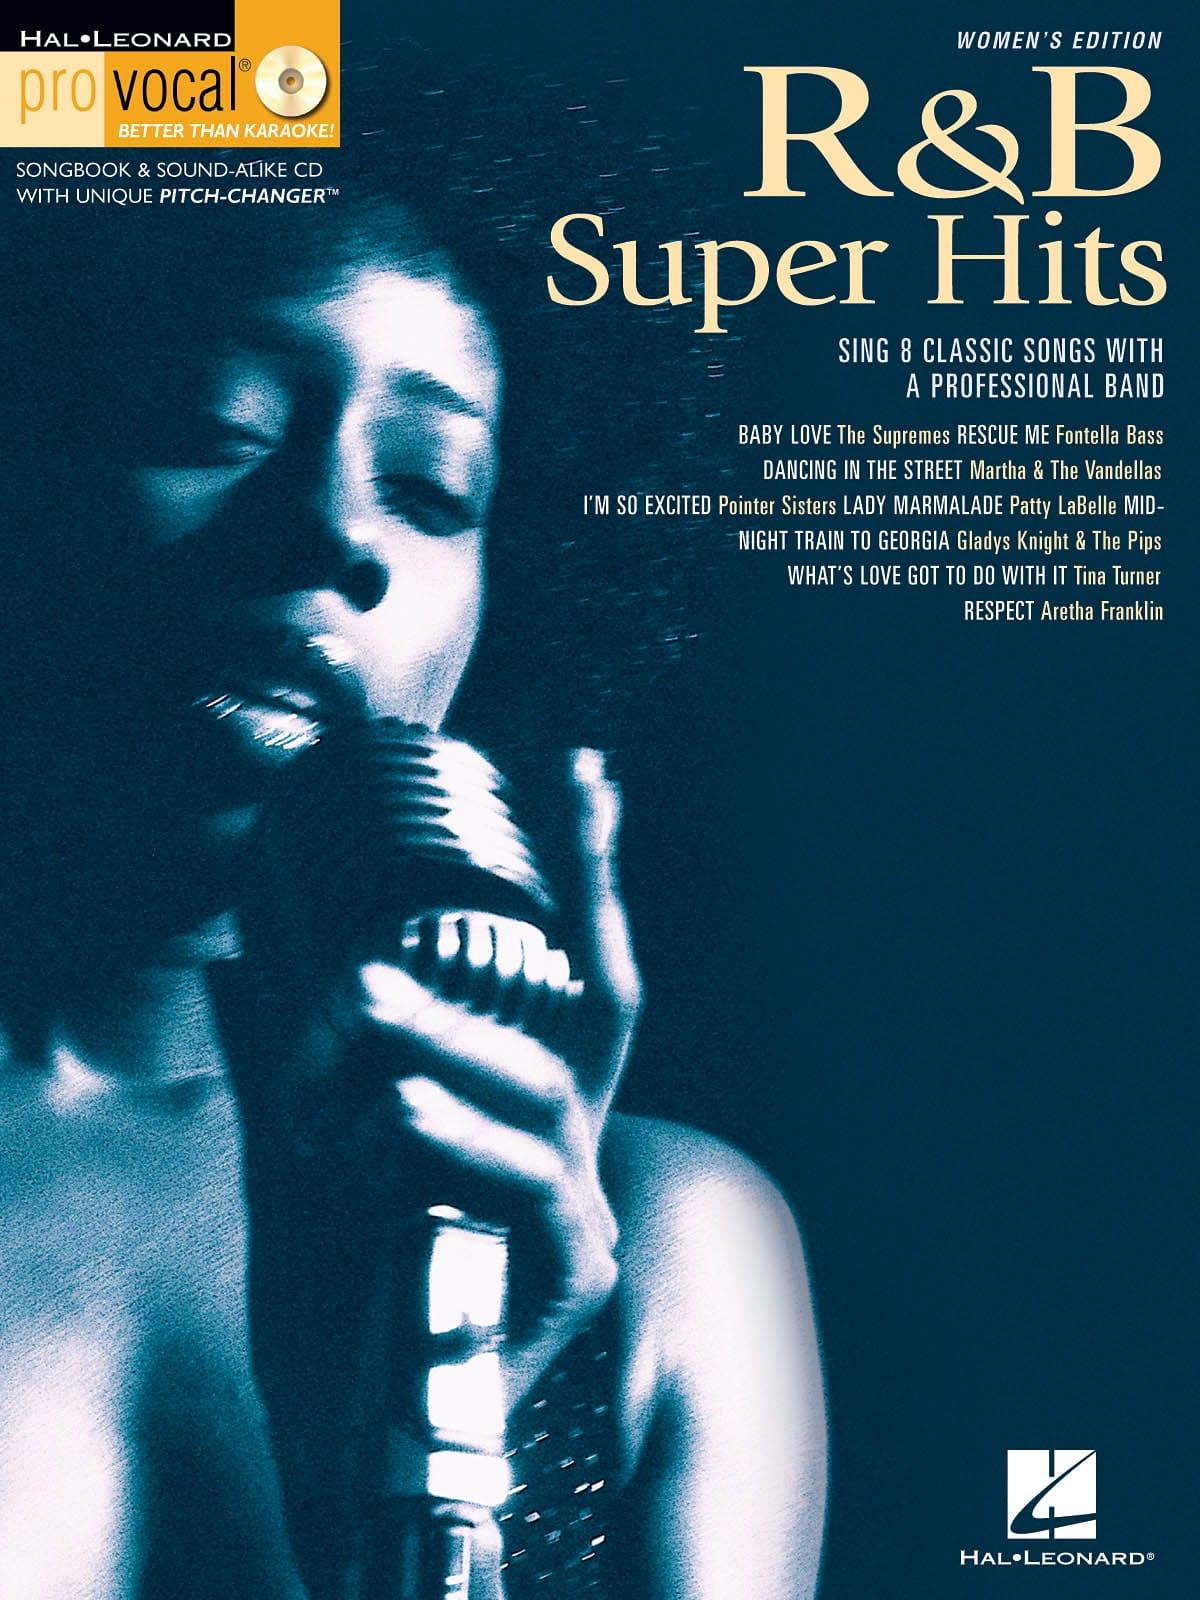 Pro Vocal Women's Edition Volume 7 - R&B Super Hits - laflutedepan.com